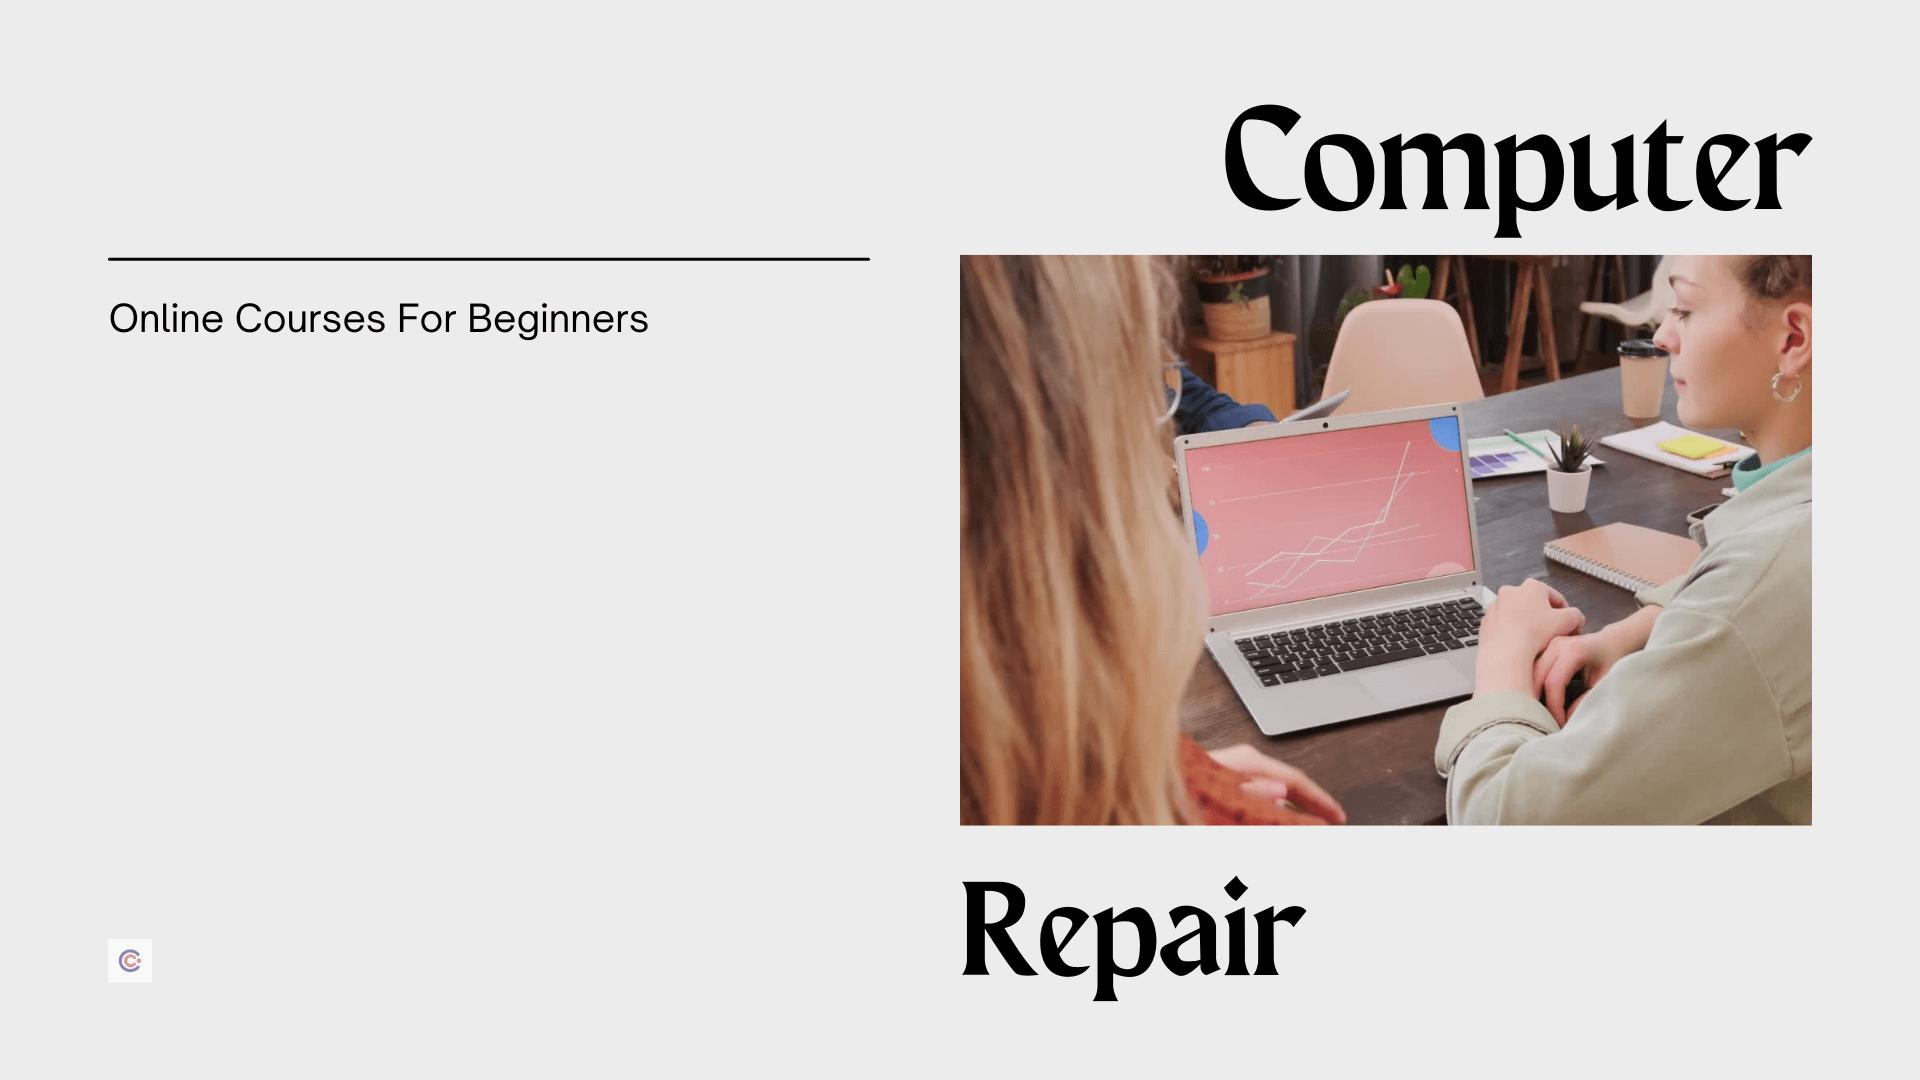 7 Best Computer Repair Classes - Learn Computer Repairing Online